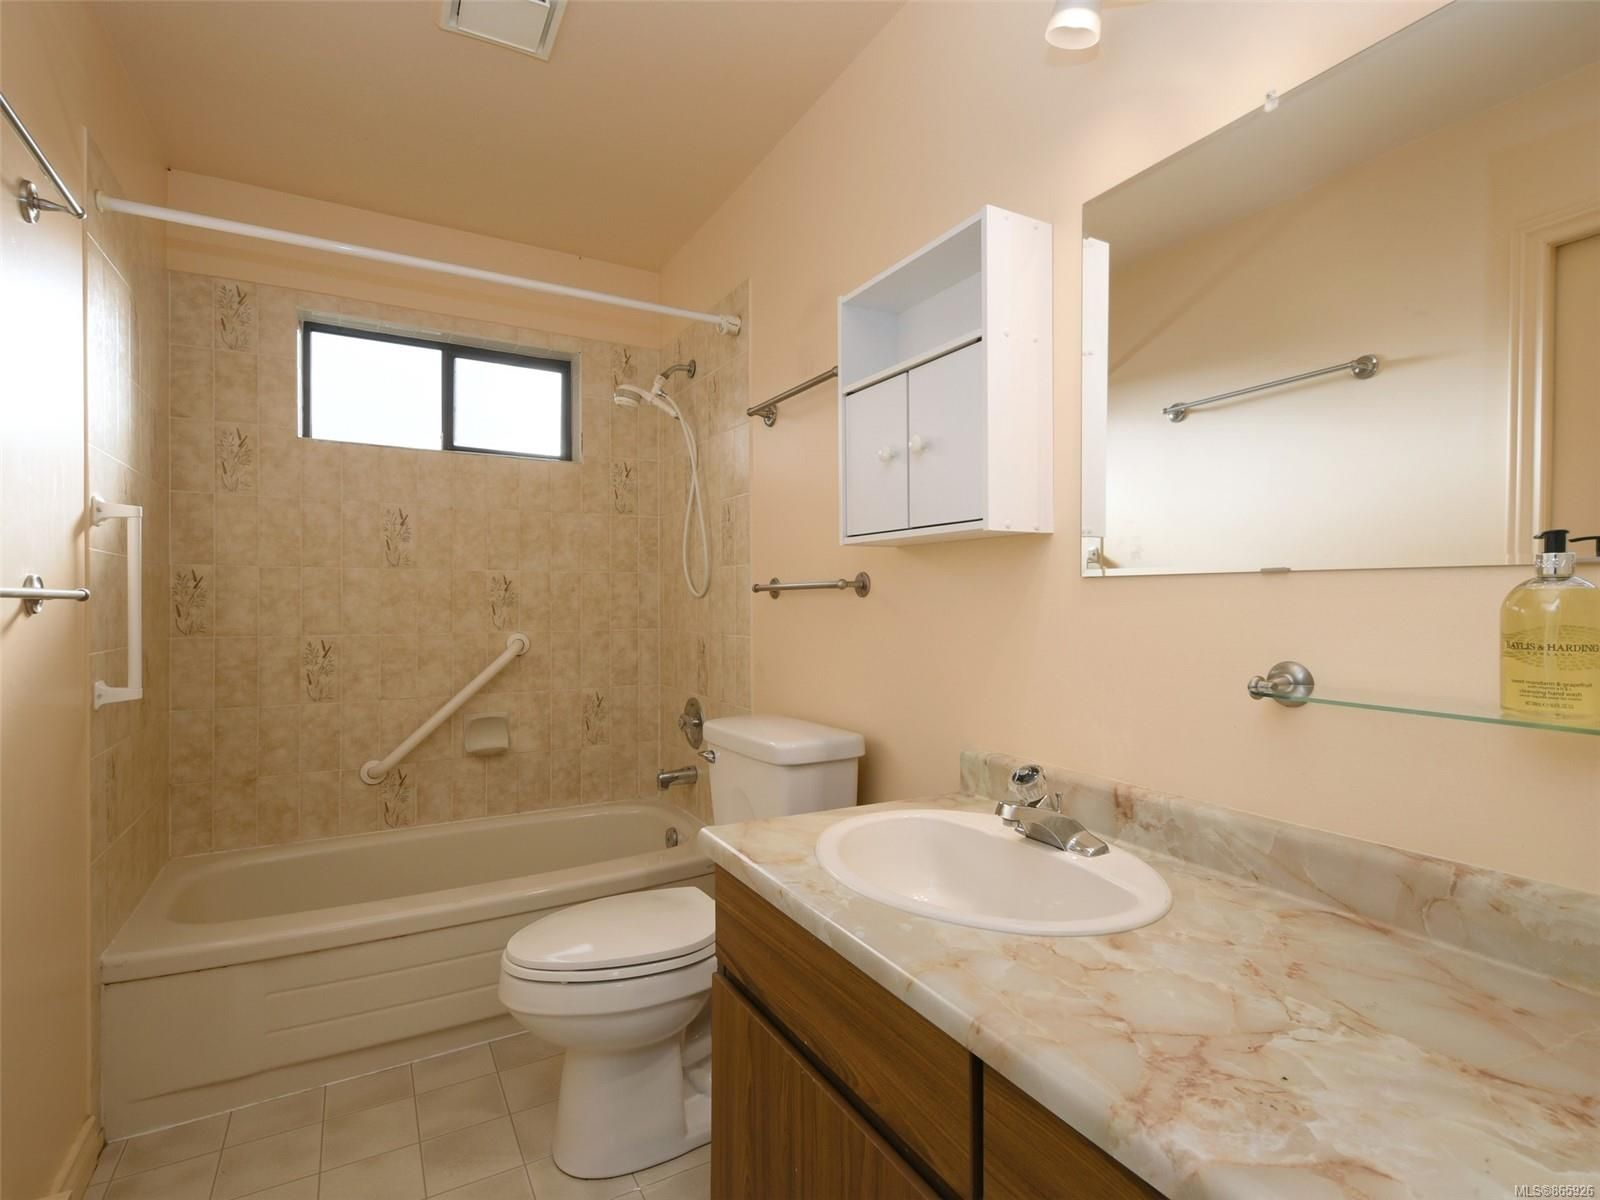 Photo 14: Photos: 8 4350 West Saanich Rd in : SW Royal Oak Row/Townhouse for sale (Saanich West)  : MLS®# 865926